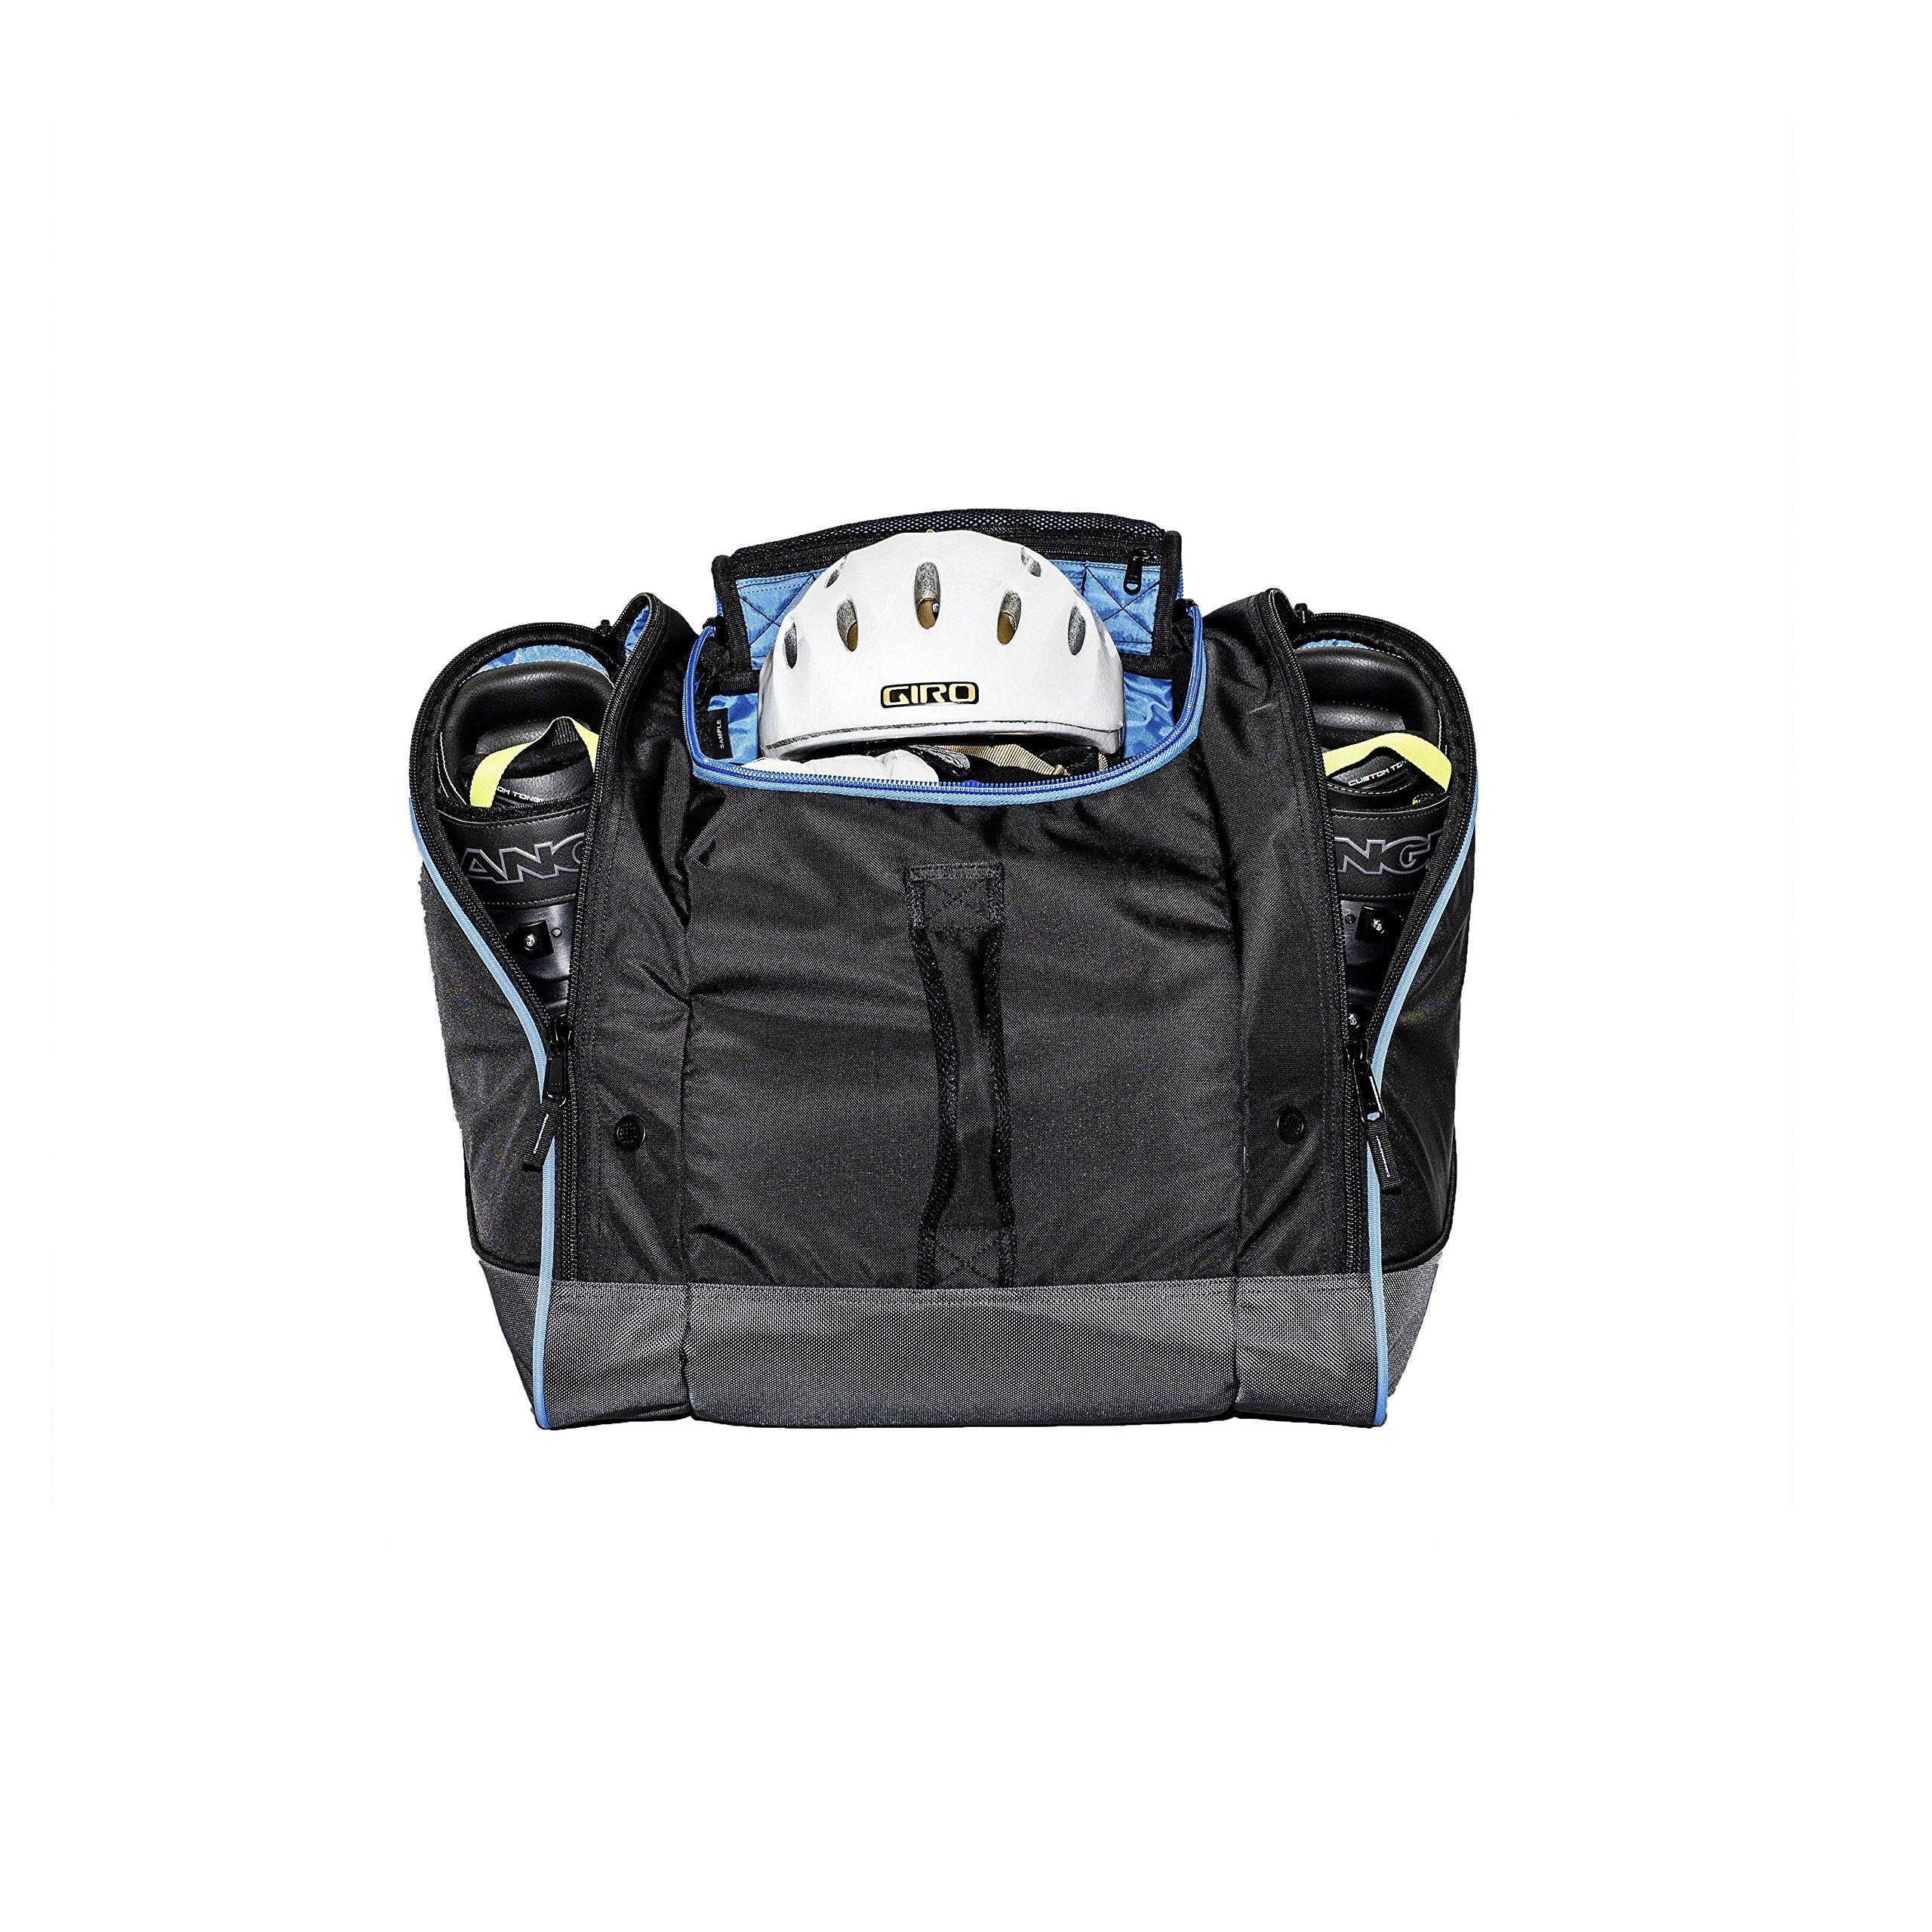 Sportube Freerider Padded Gear and Boot Bag Blue/Black by Sportube